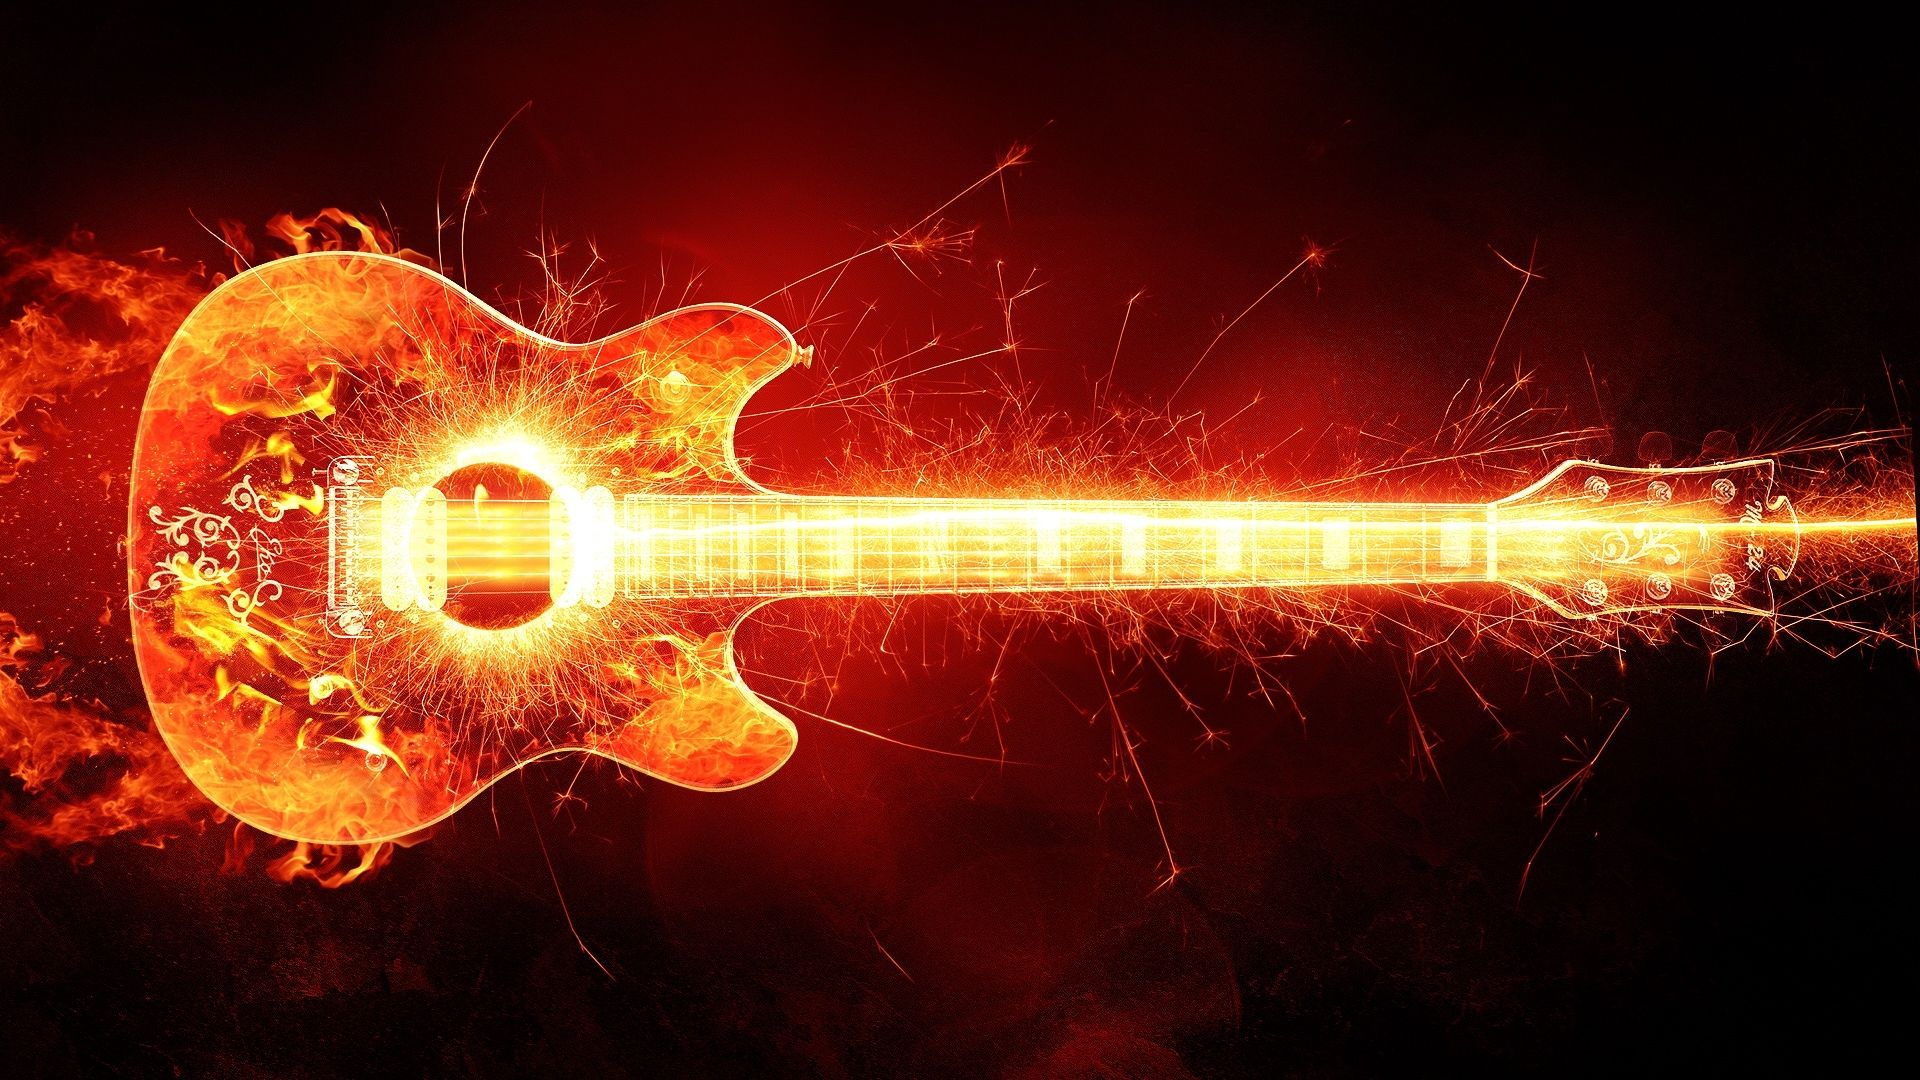 Guitar Abstract, HD Wallpaper 1080